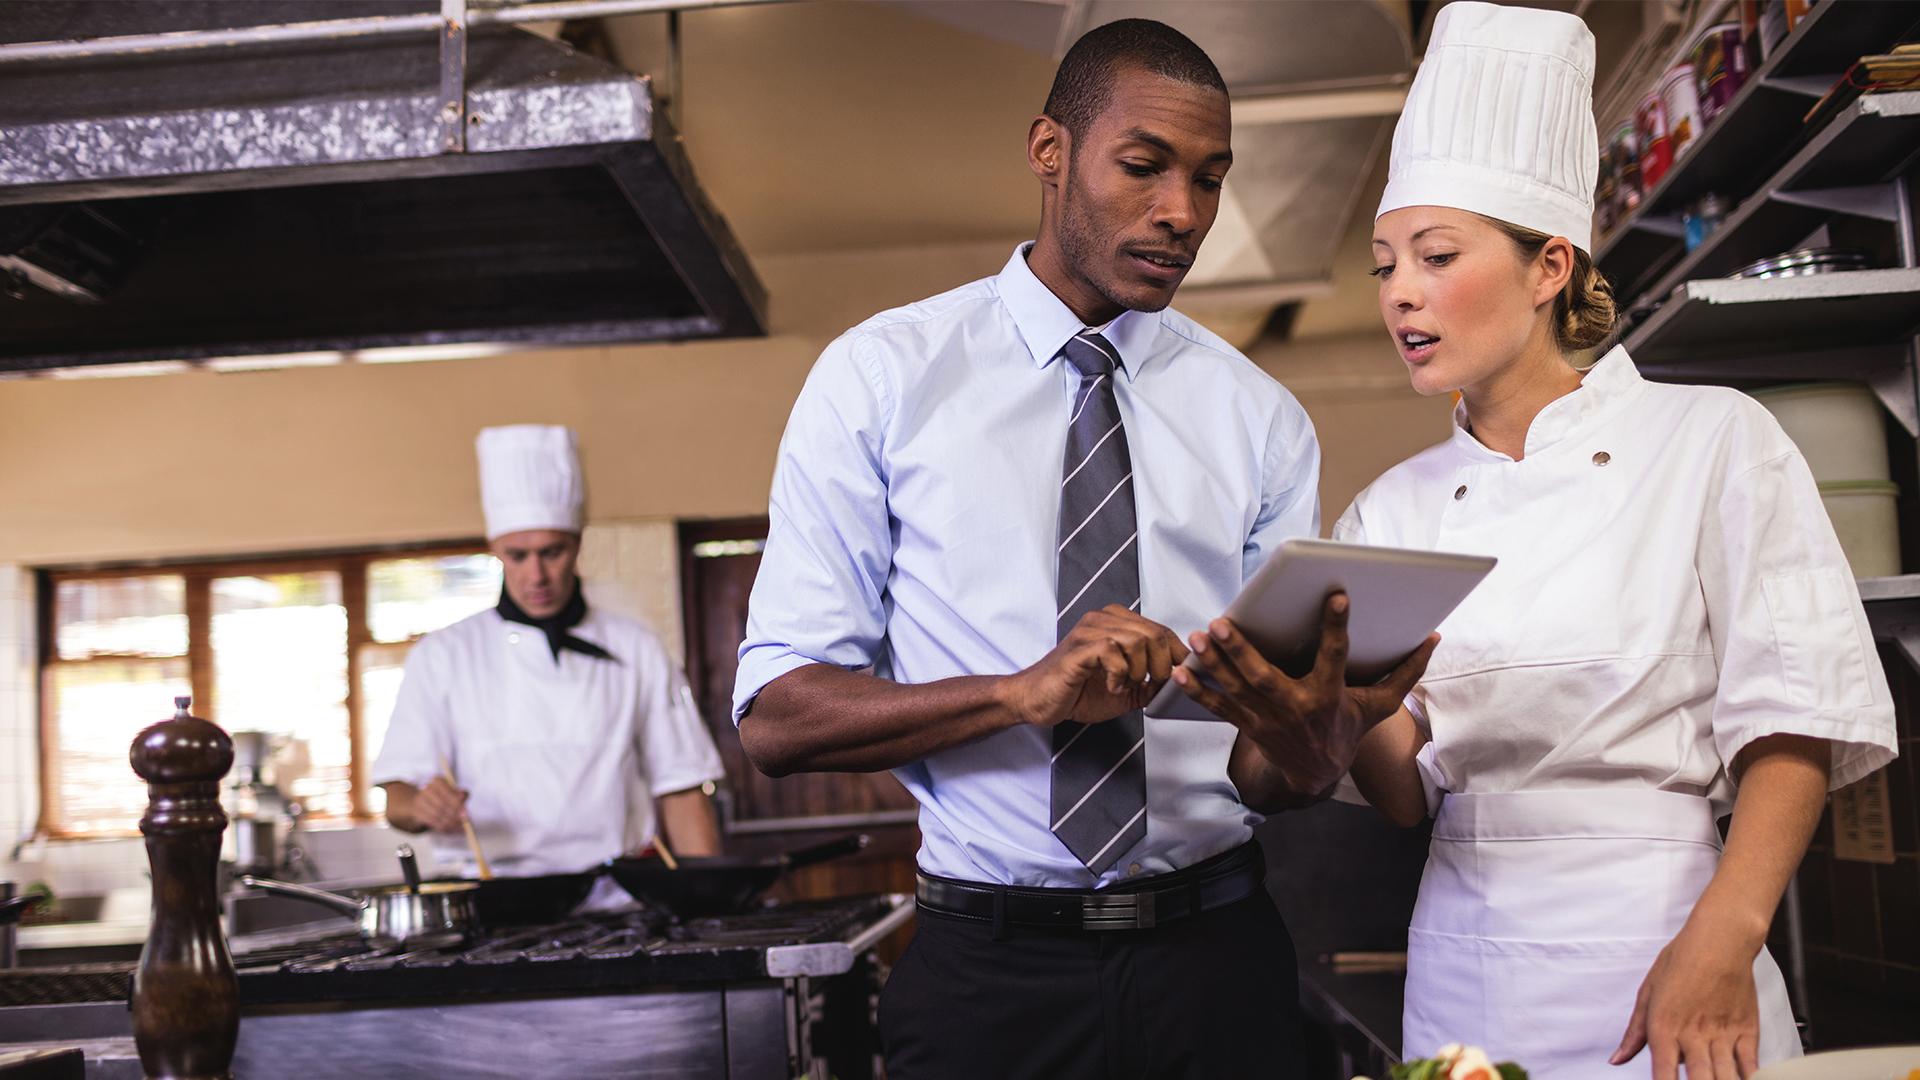 Chef and restauranteur